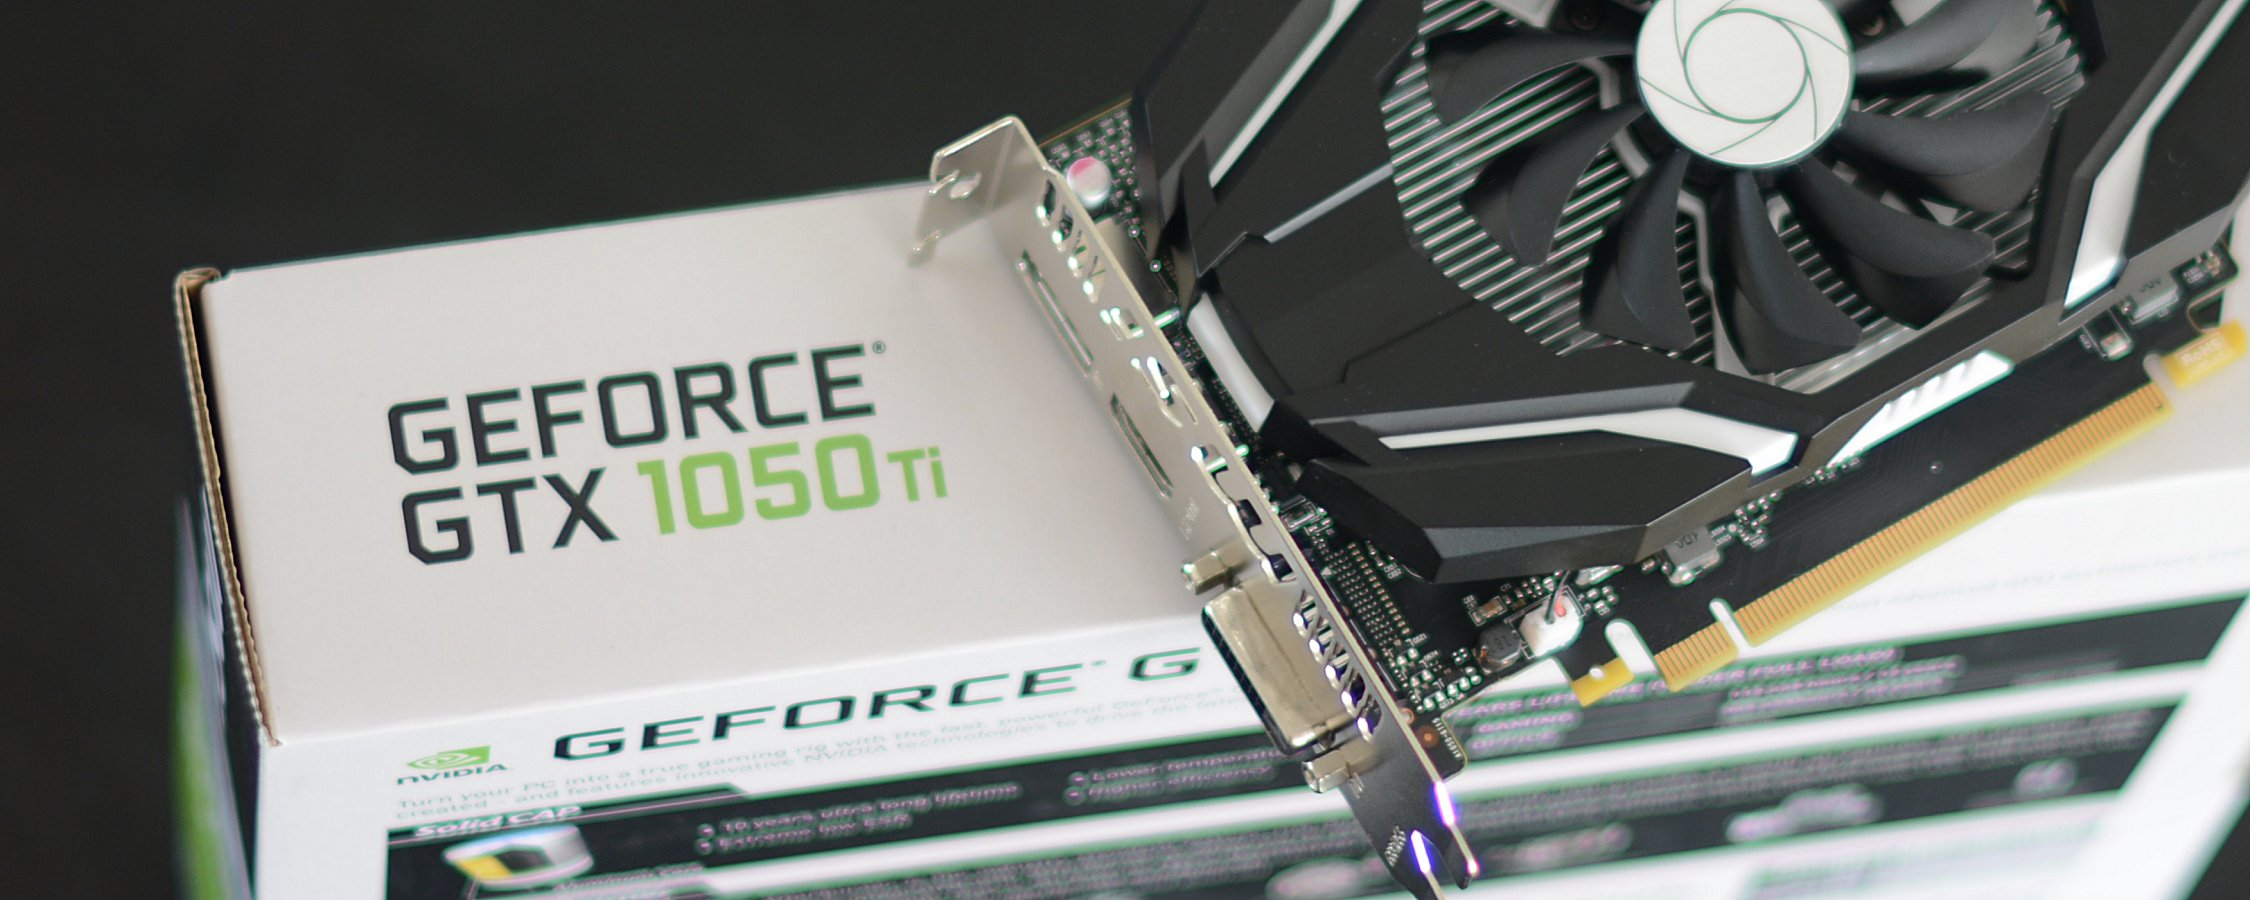 Nvidia Geforce GTX 1050 TI Hashrate